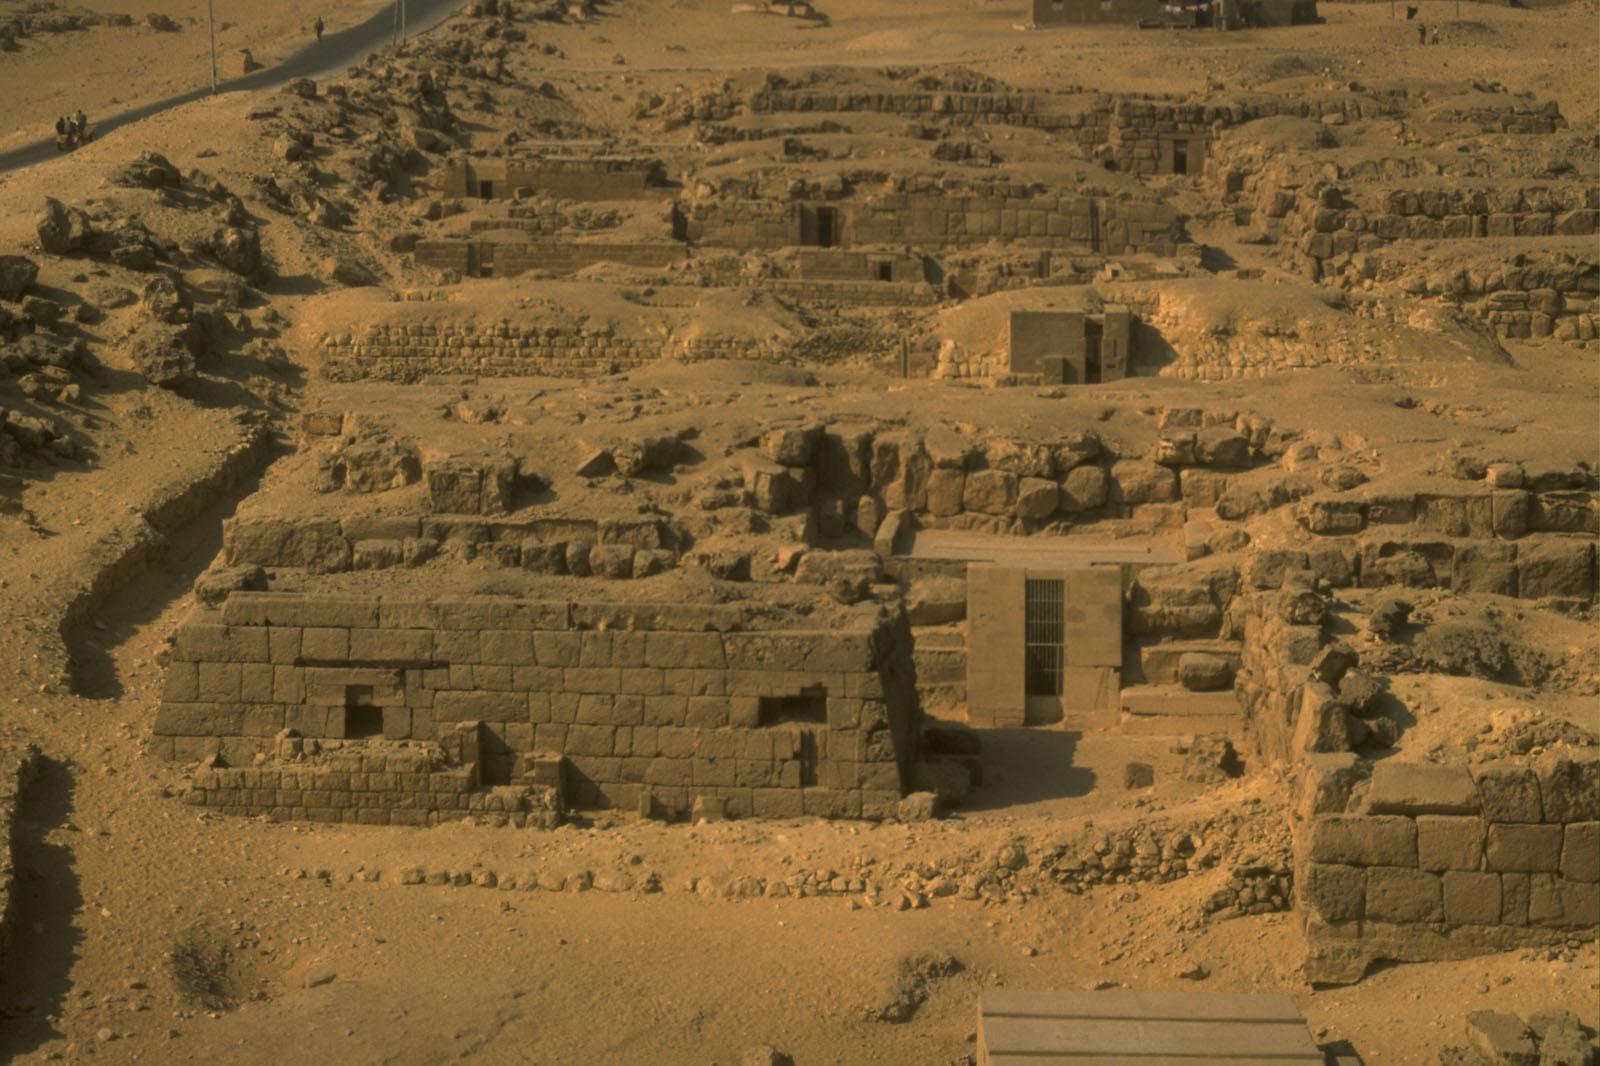 Khufu Pyramid Complex: Site: Giza; View: G 5210, G 5110